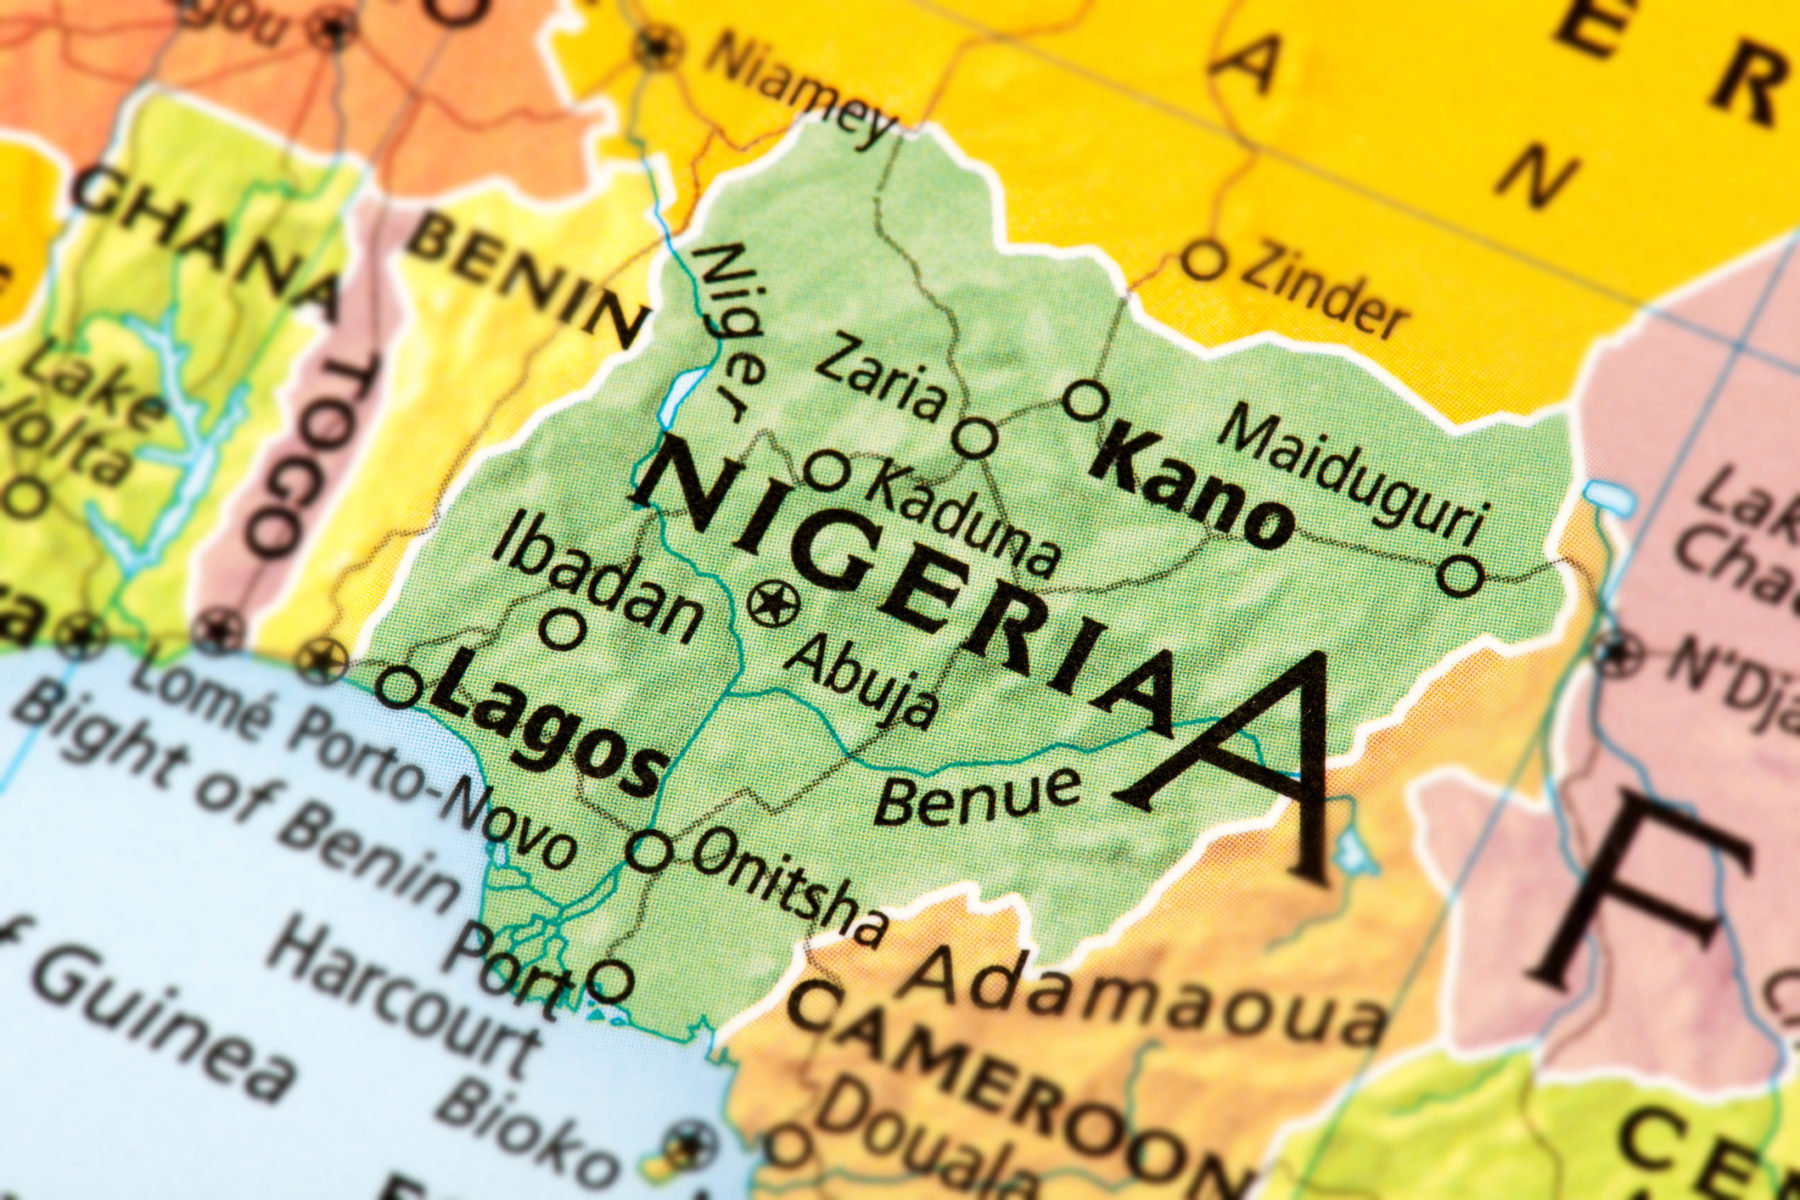 140 jeunes ont été enlevés au lycée chrétiens Bethel Baptistde l'État de Kaduna au Nigéria